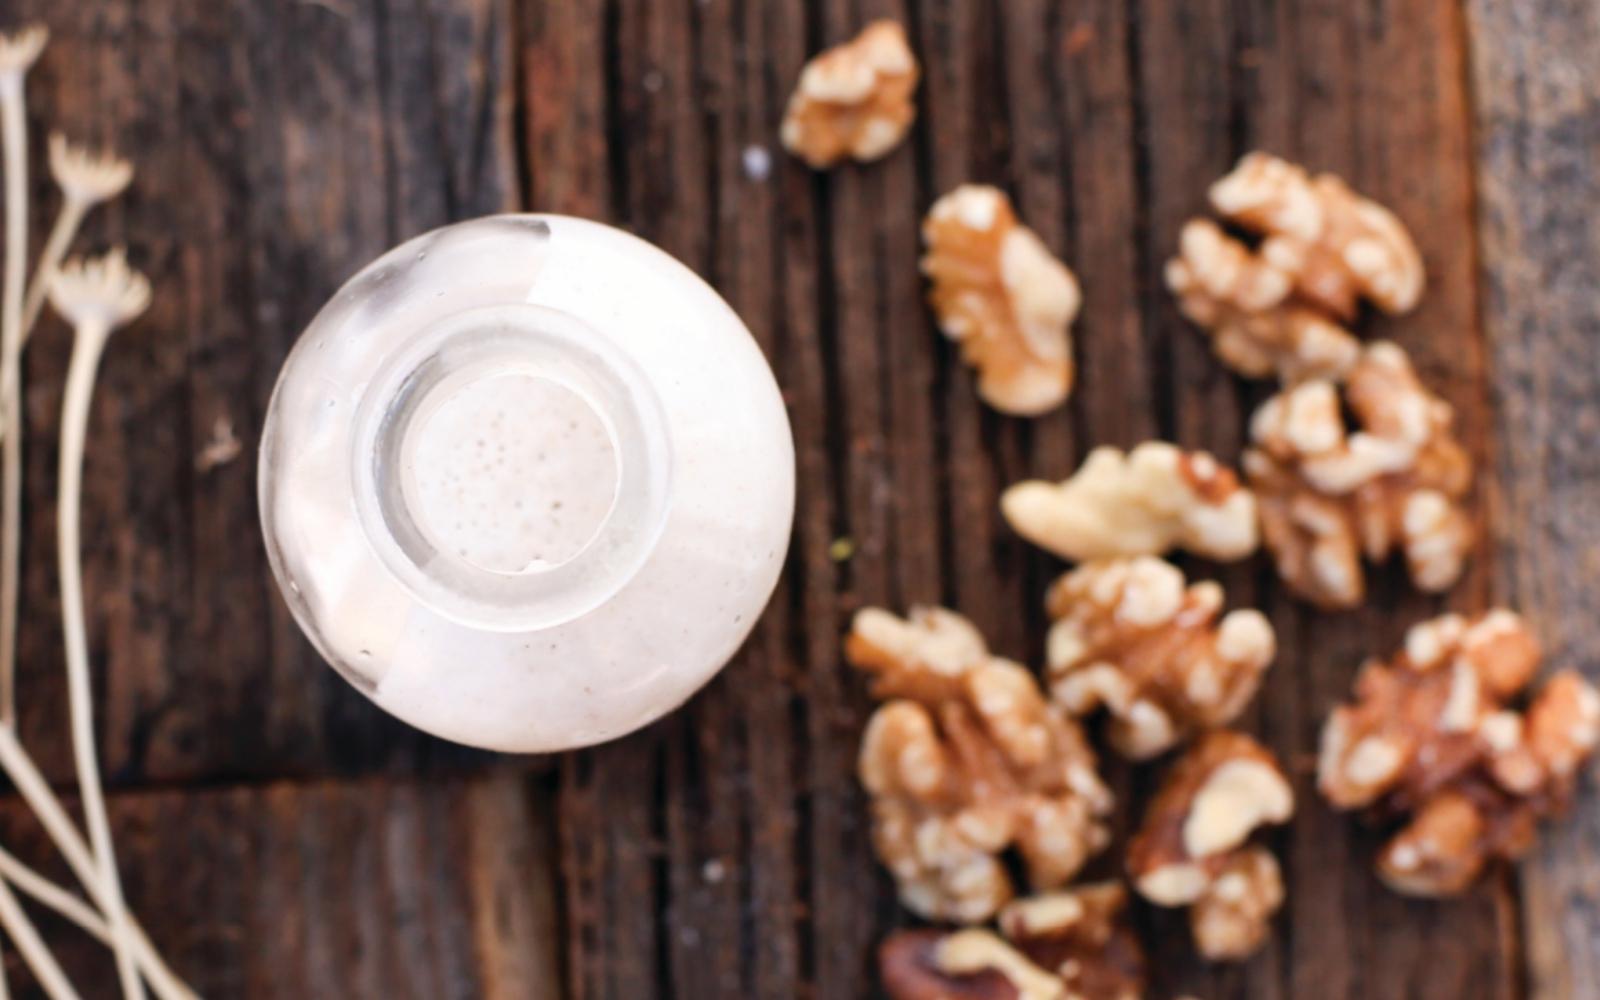 Almond-Macadamia Nut Creamer